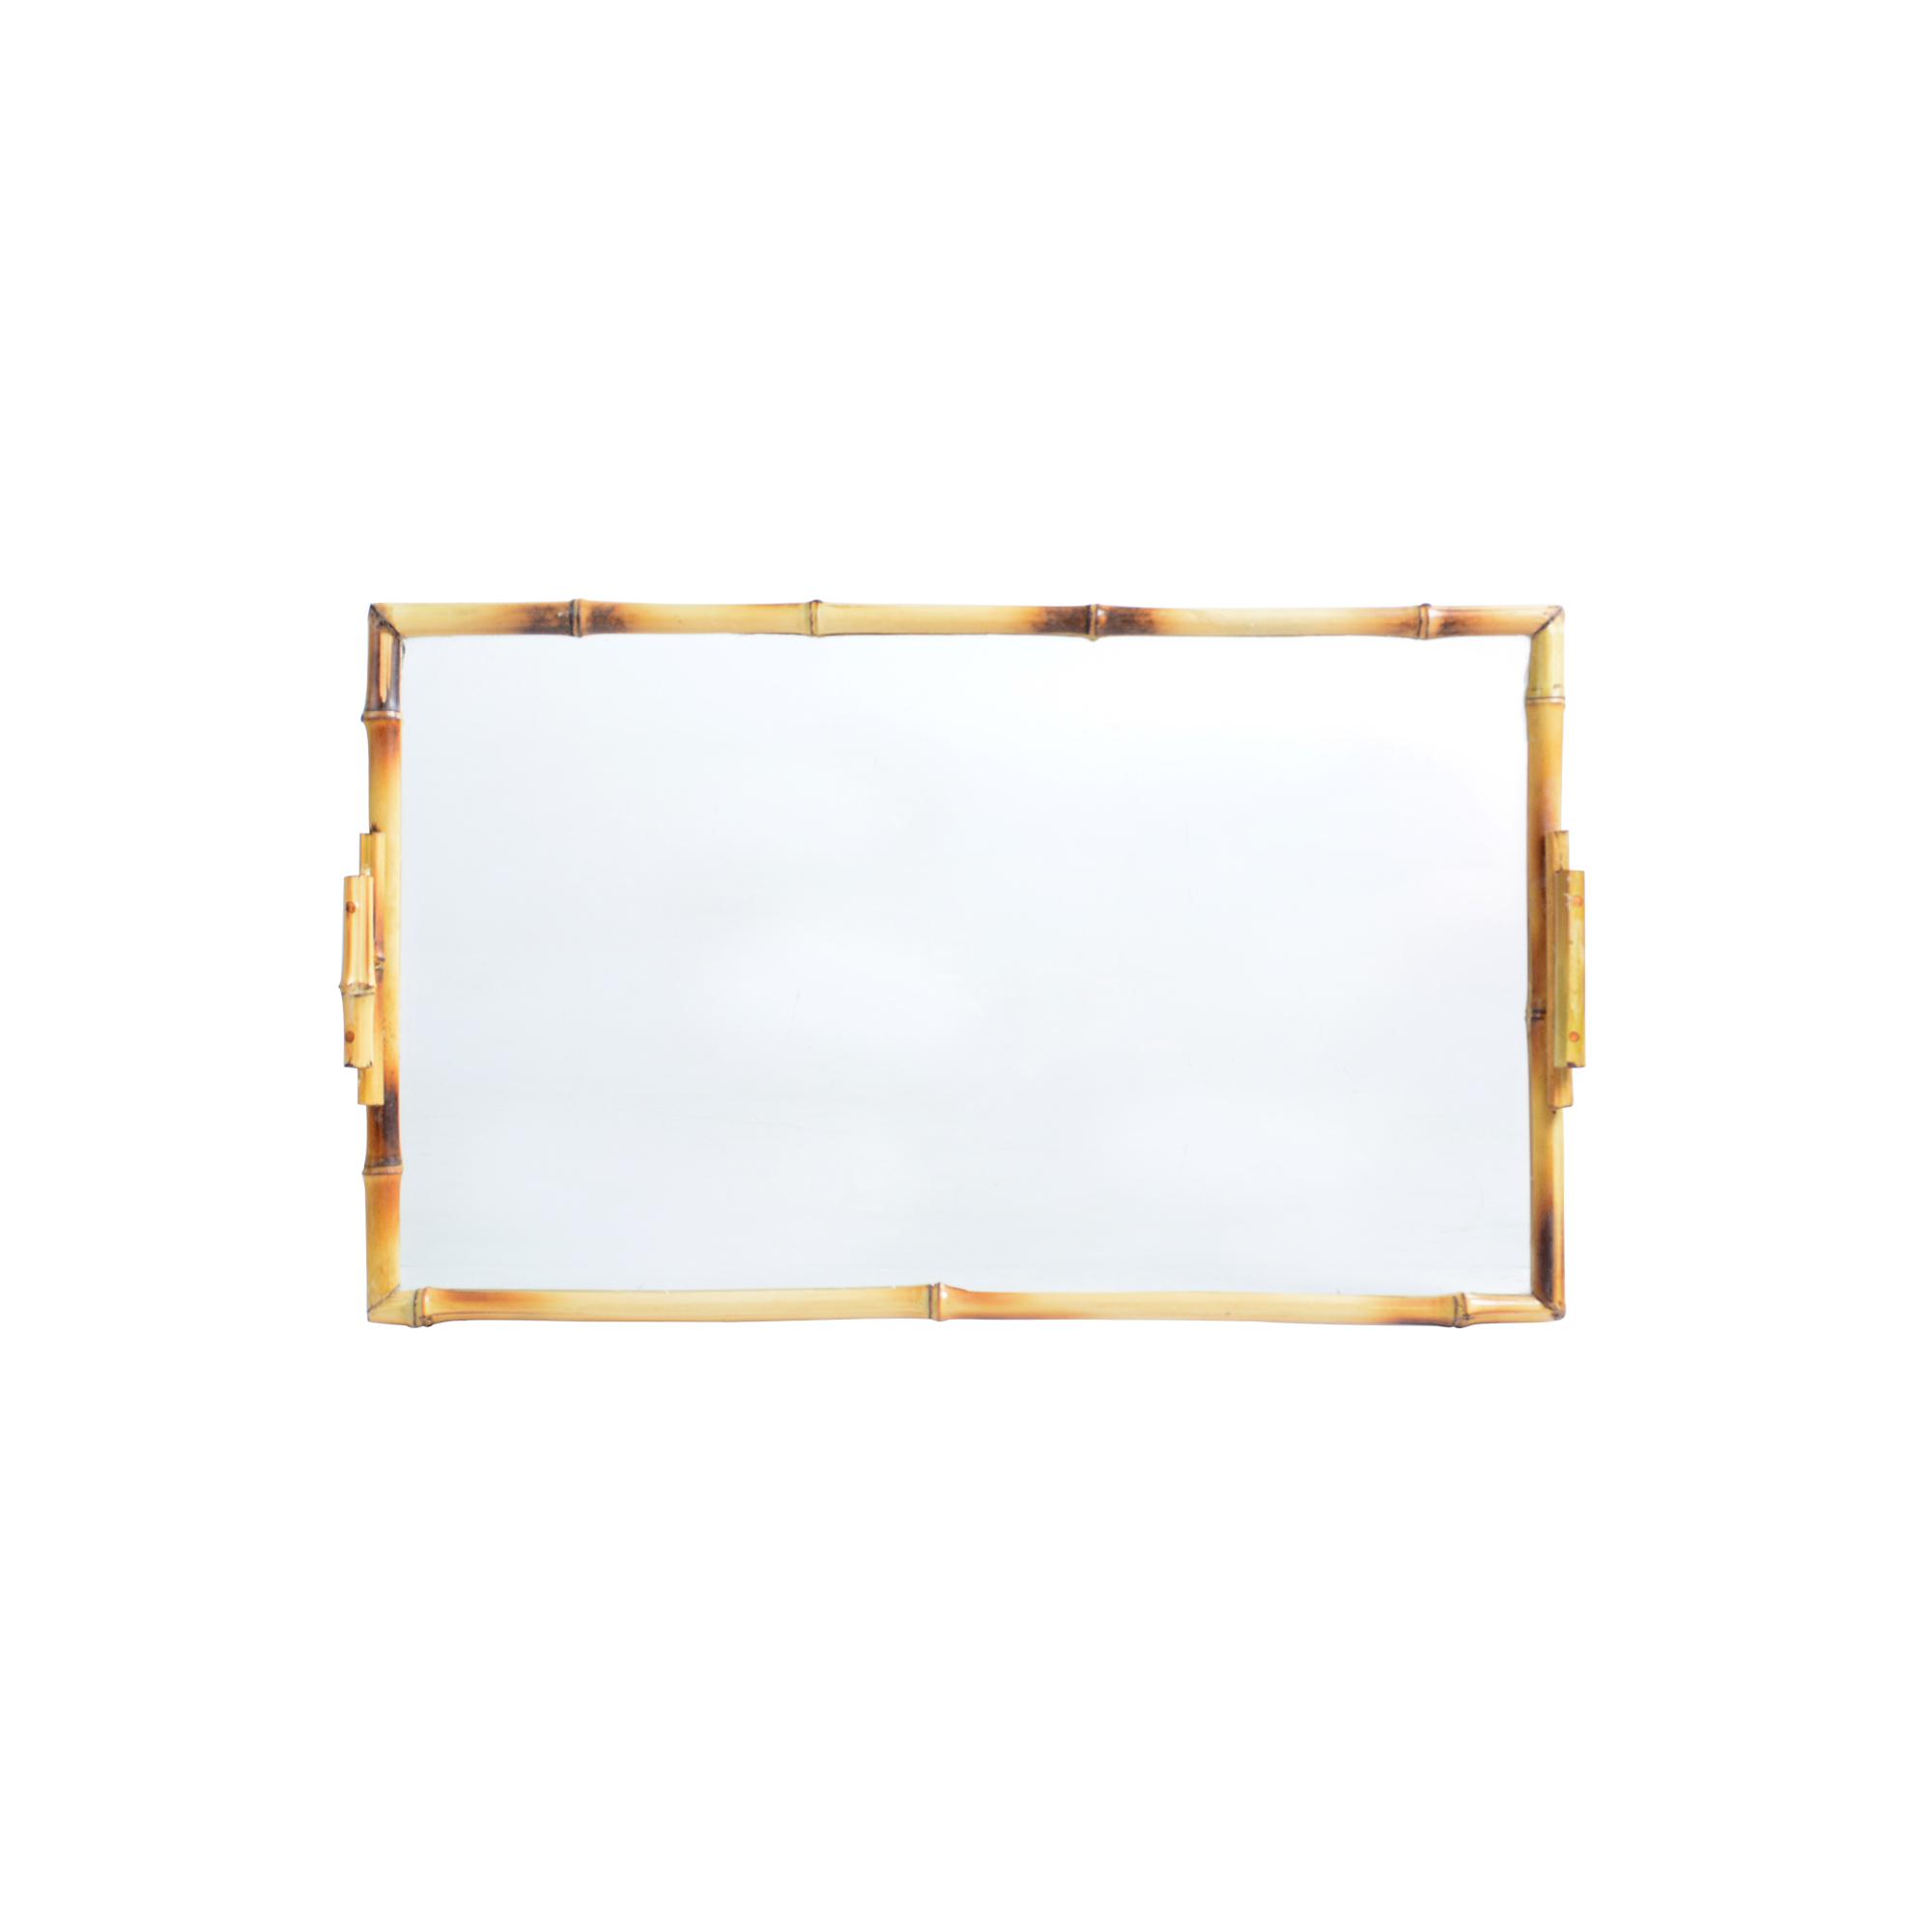 Bandeja de Bambu com vidro retangular GG lisa